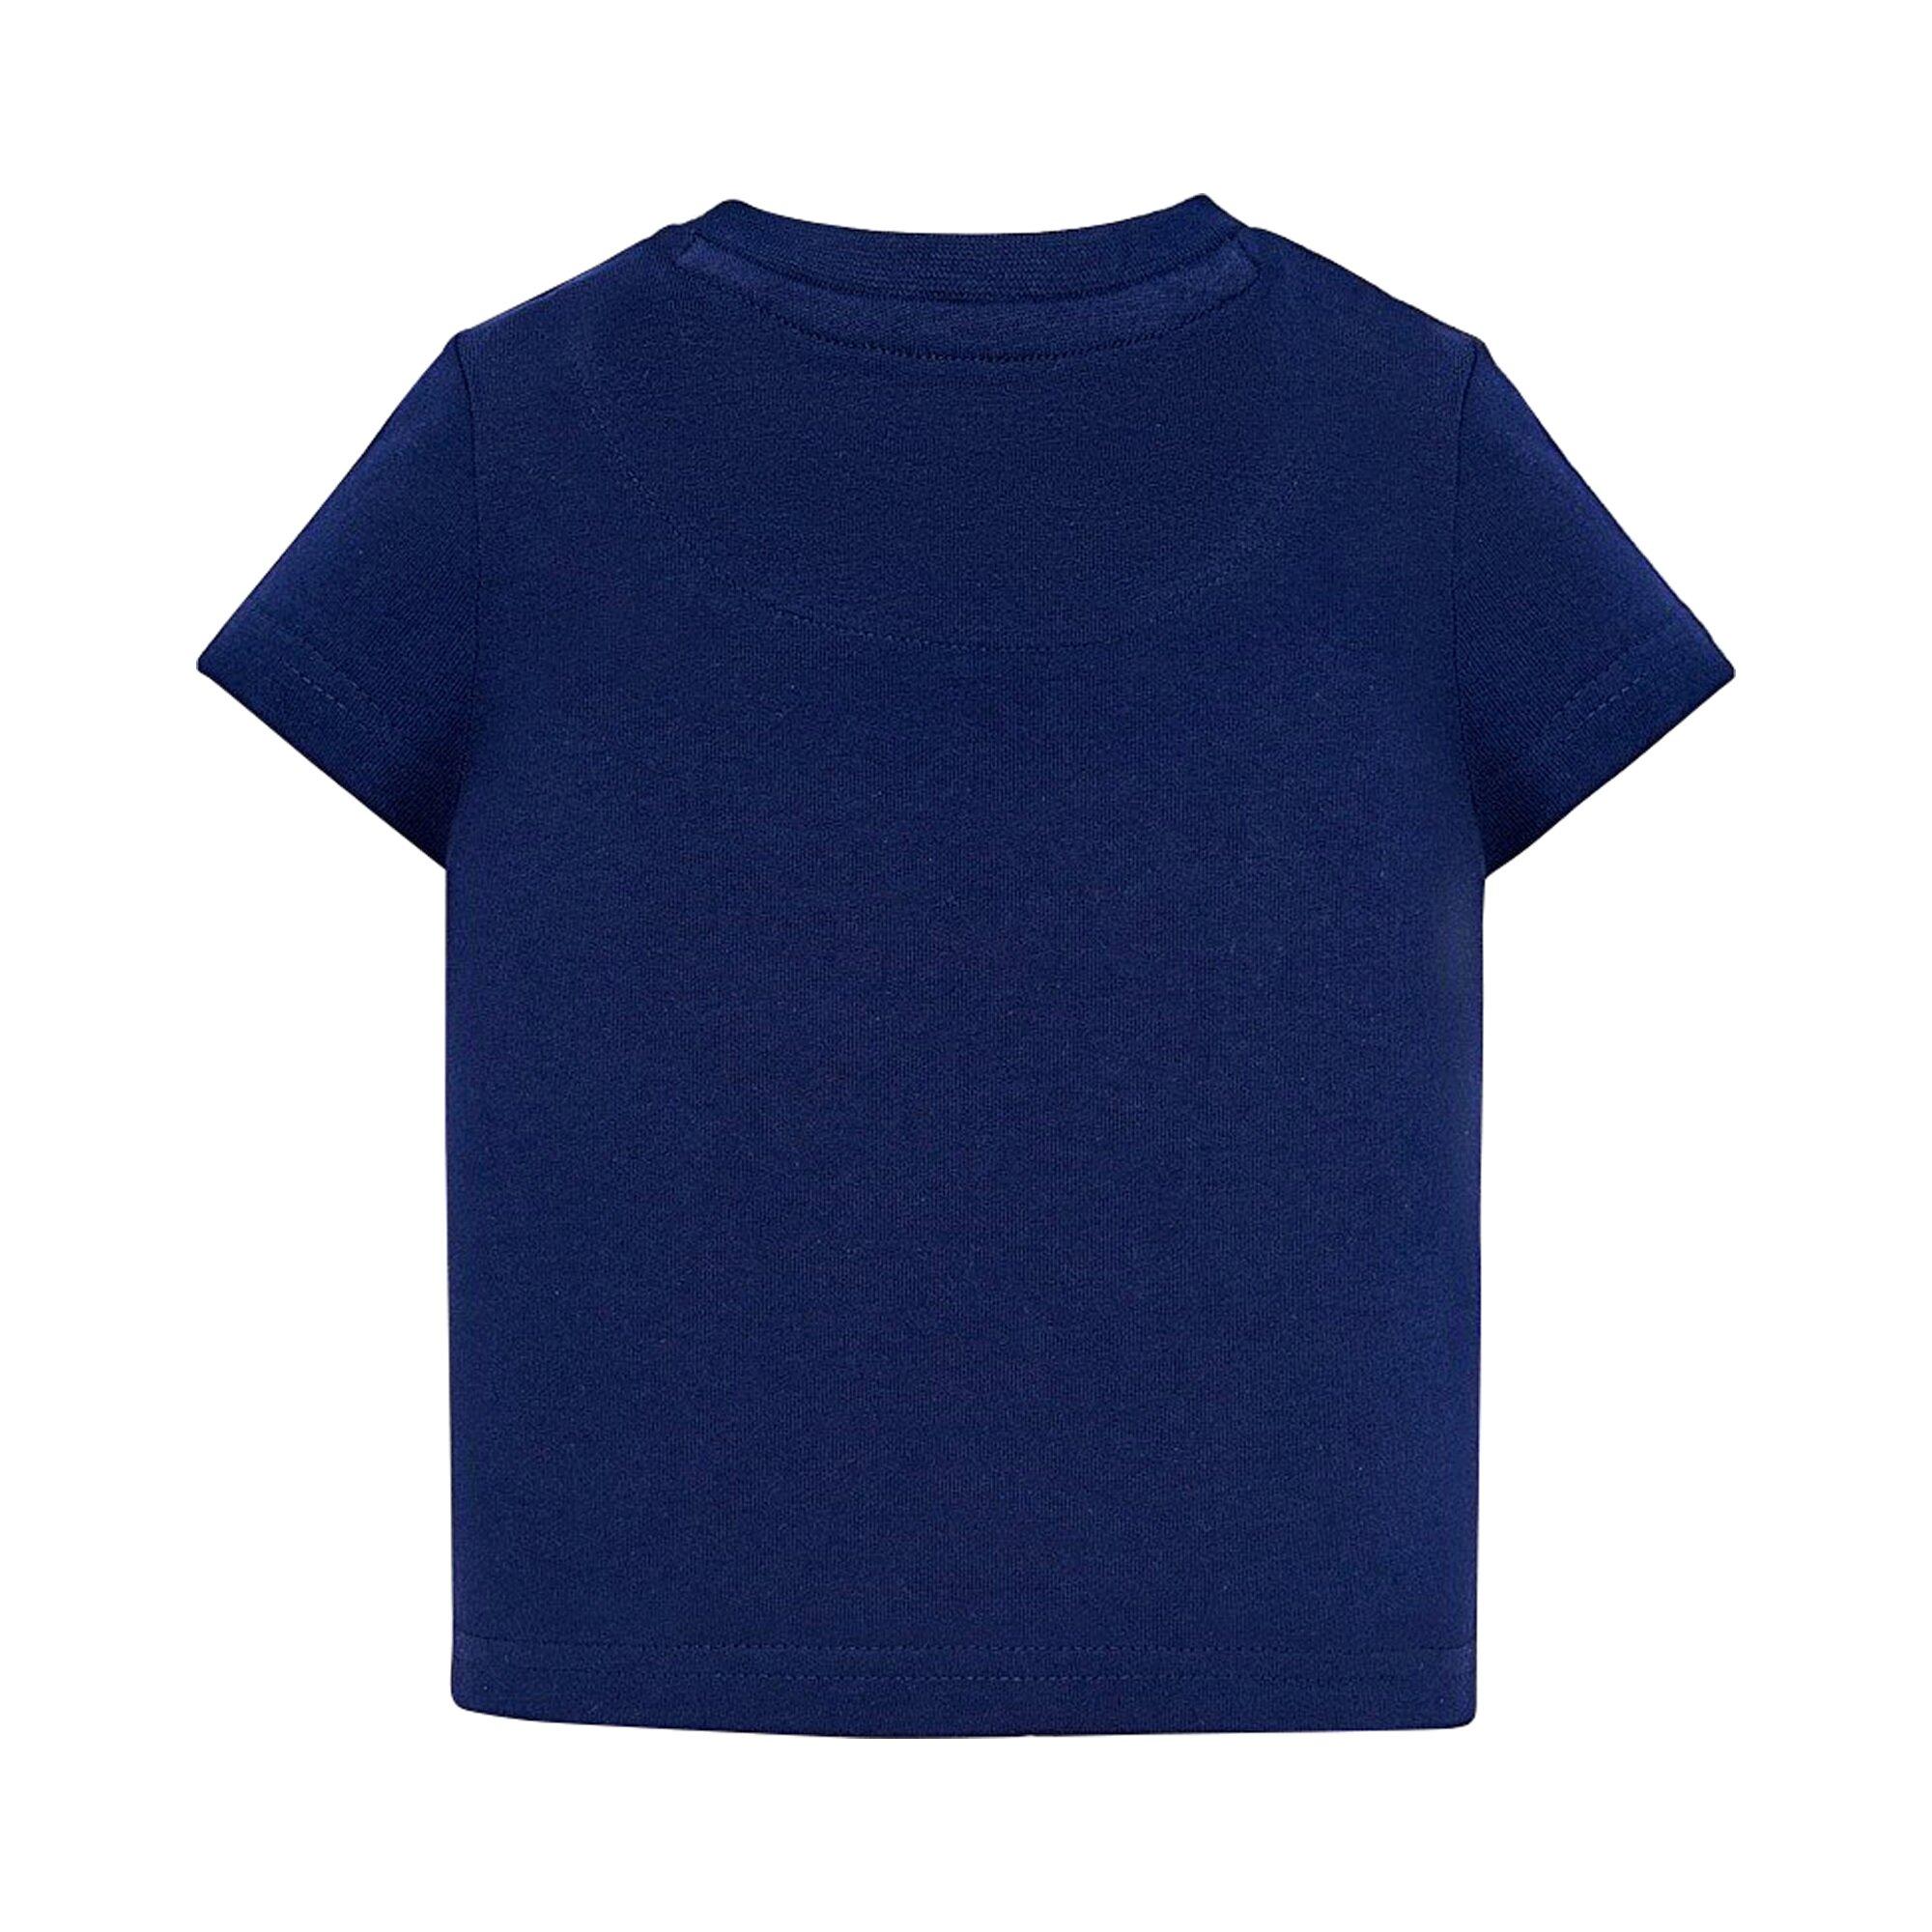 mayoral-t-shirt-hunde